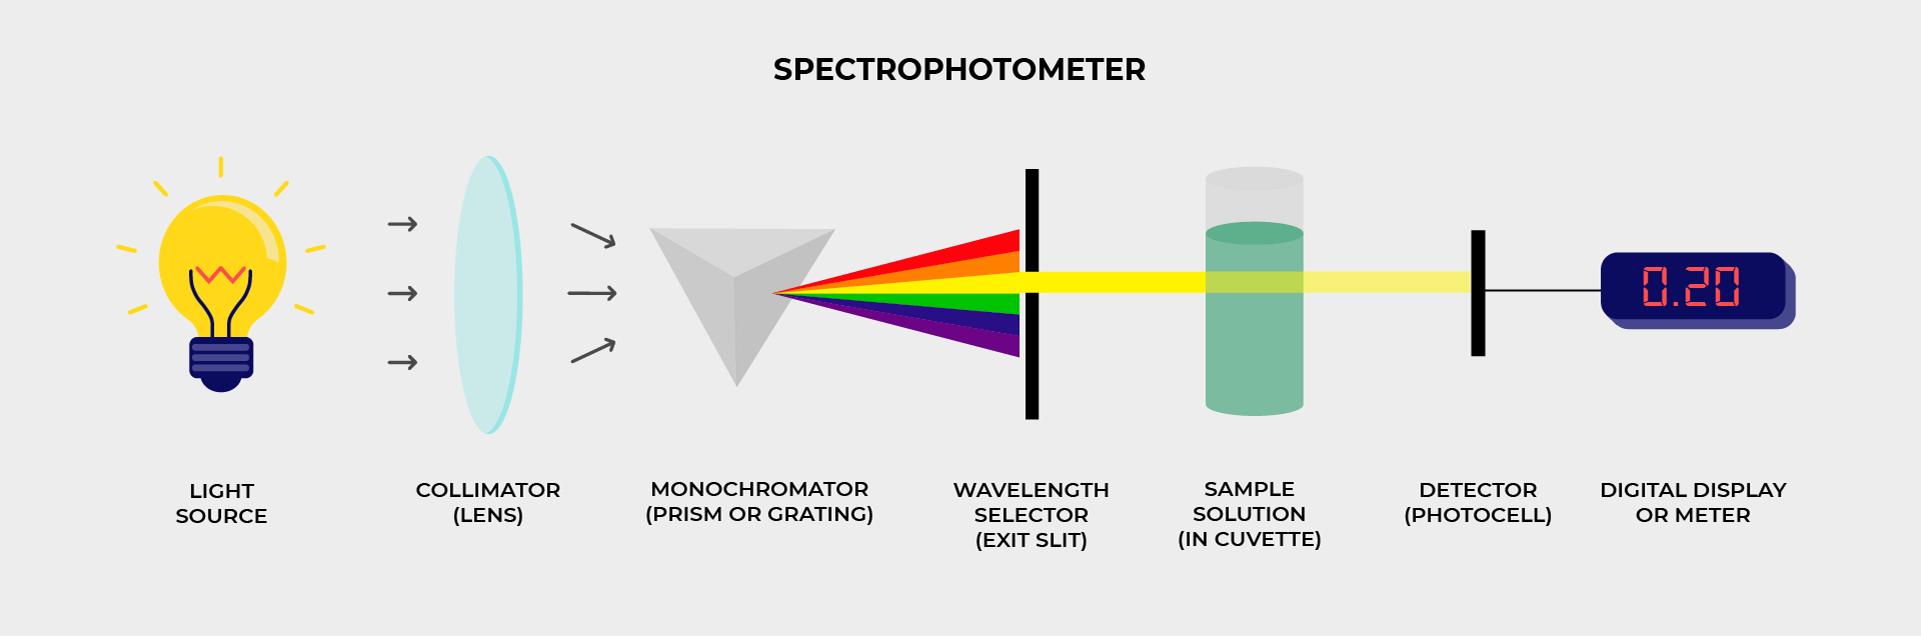 Spectrophotometer_new